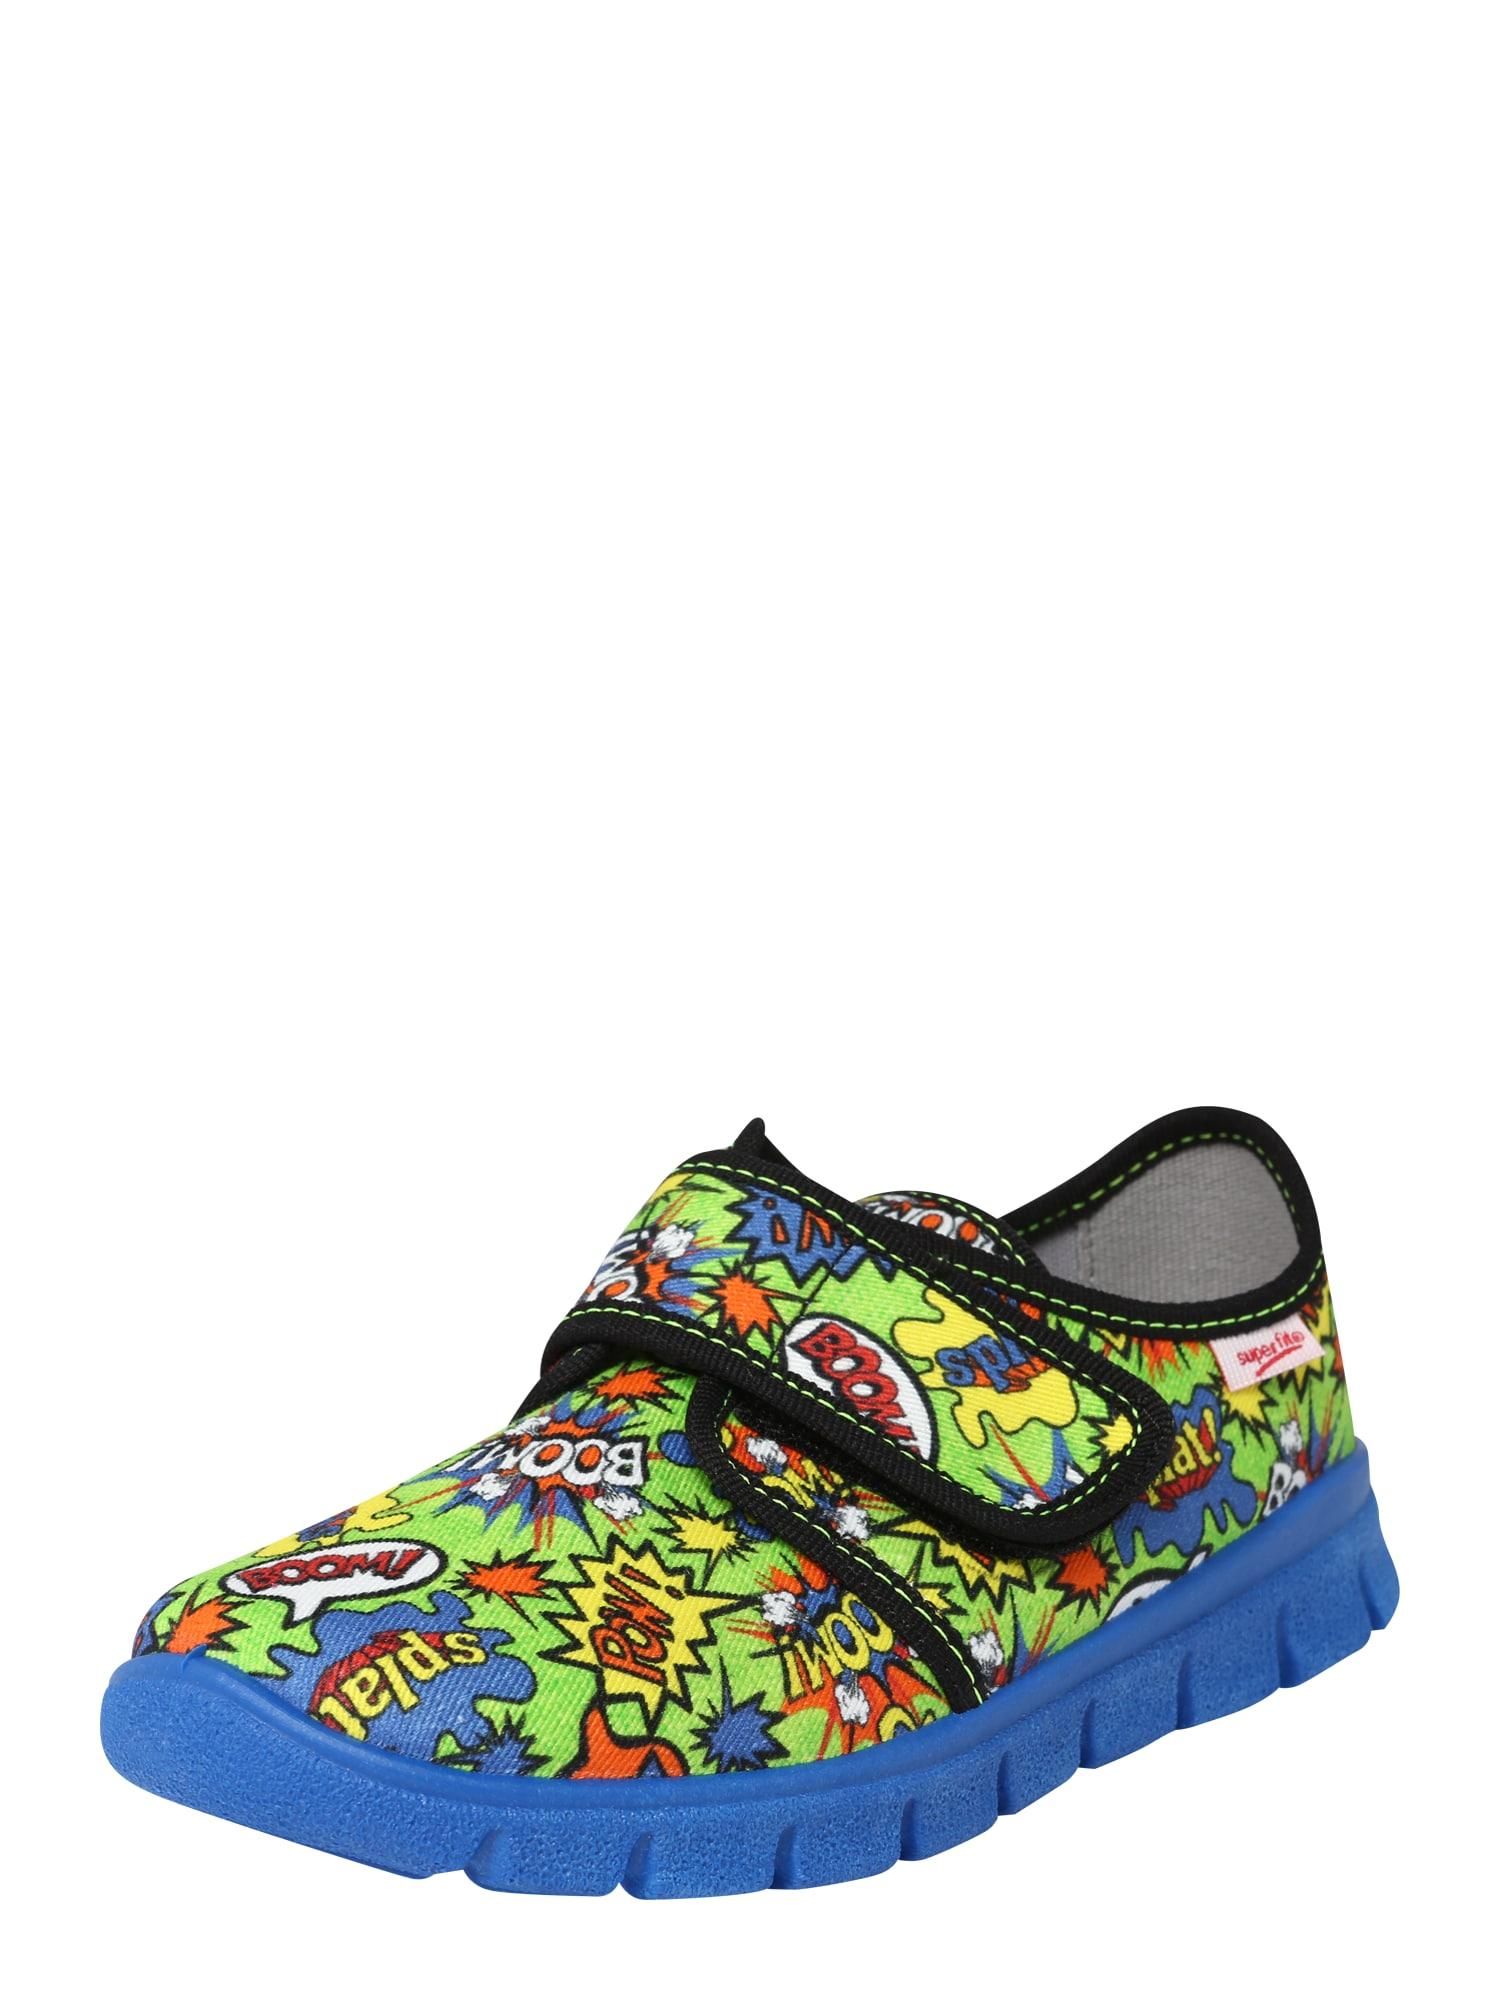 Pantofle BOBBY modrá mix barev SUPERFIT